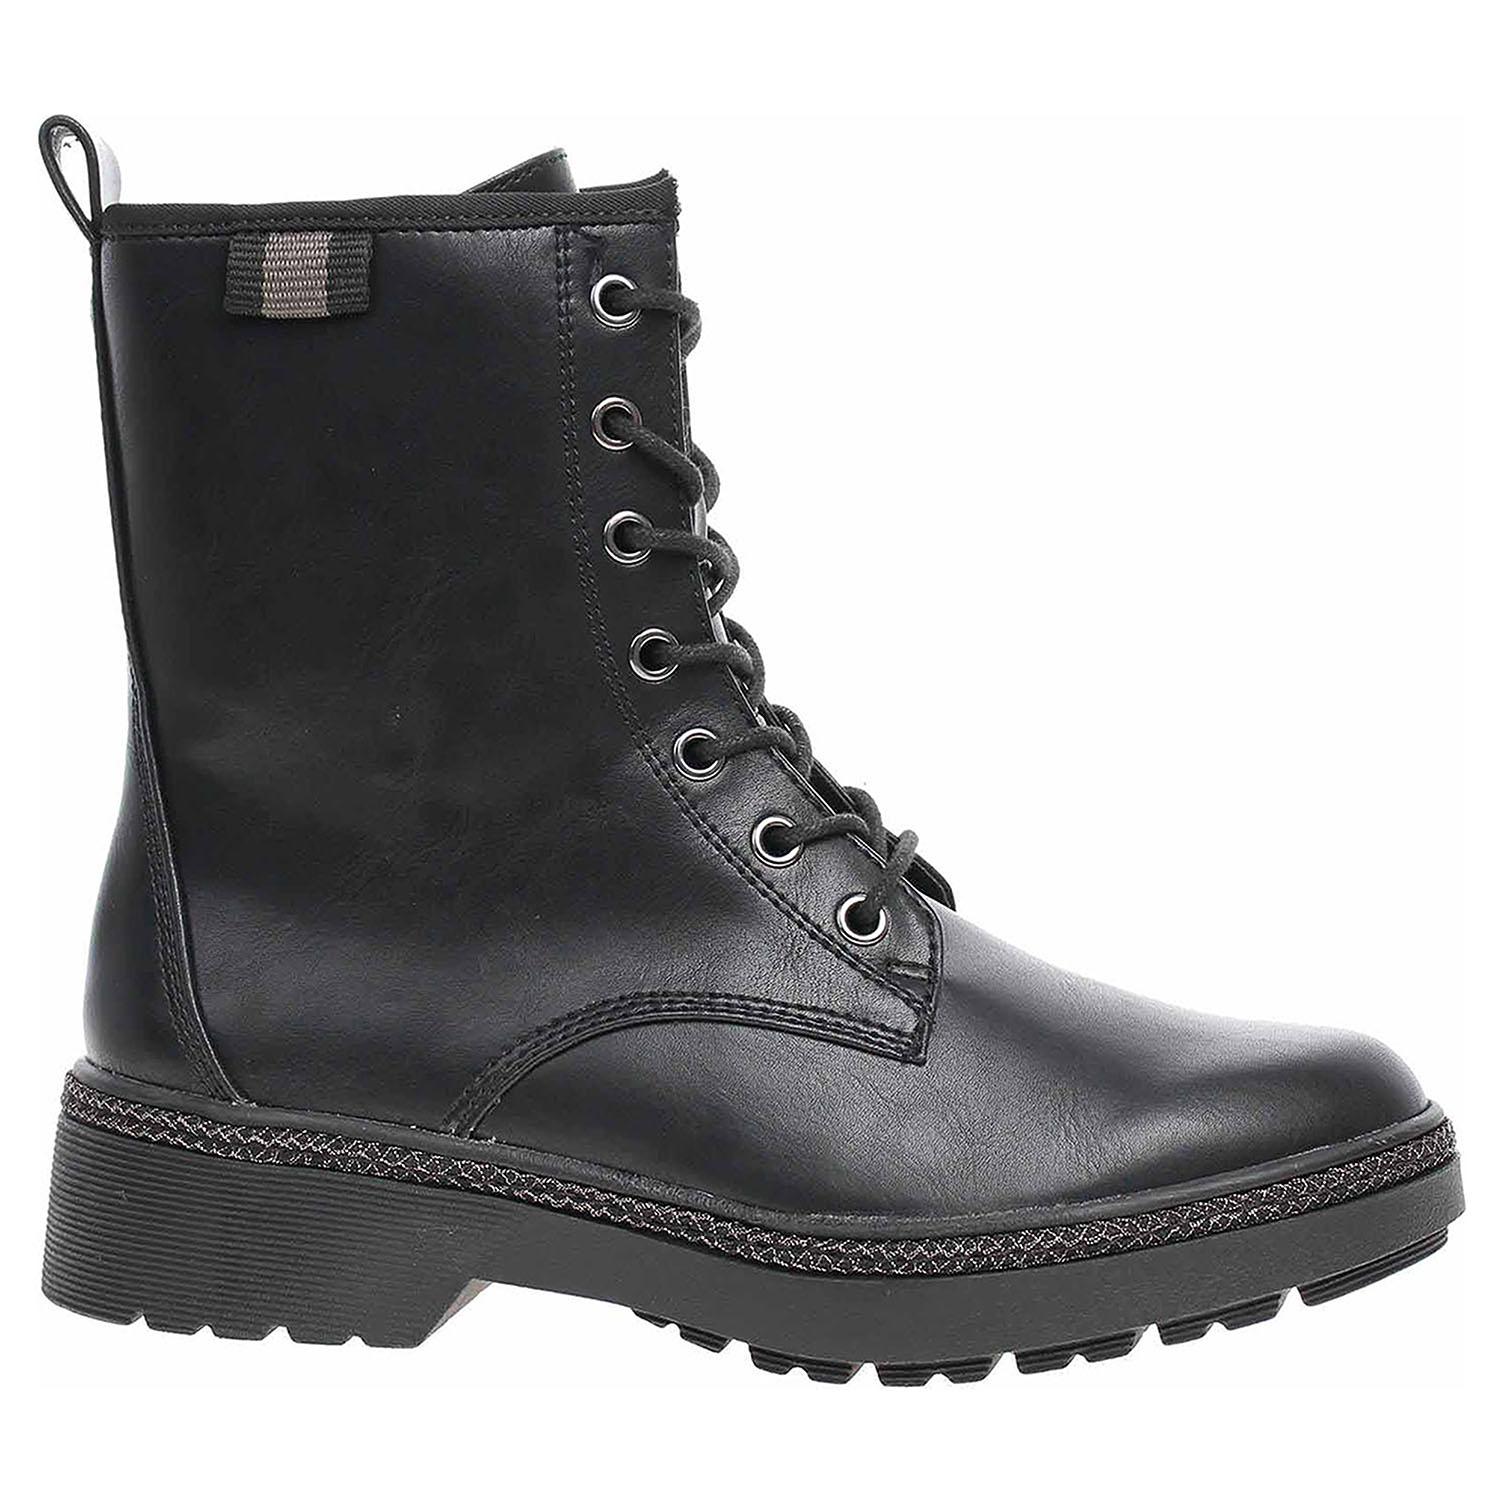 Dámská kotníková obuv Tamaris 1-25224-23 black matt 1-1-25224-23 020 39